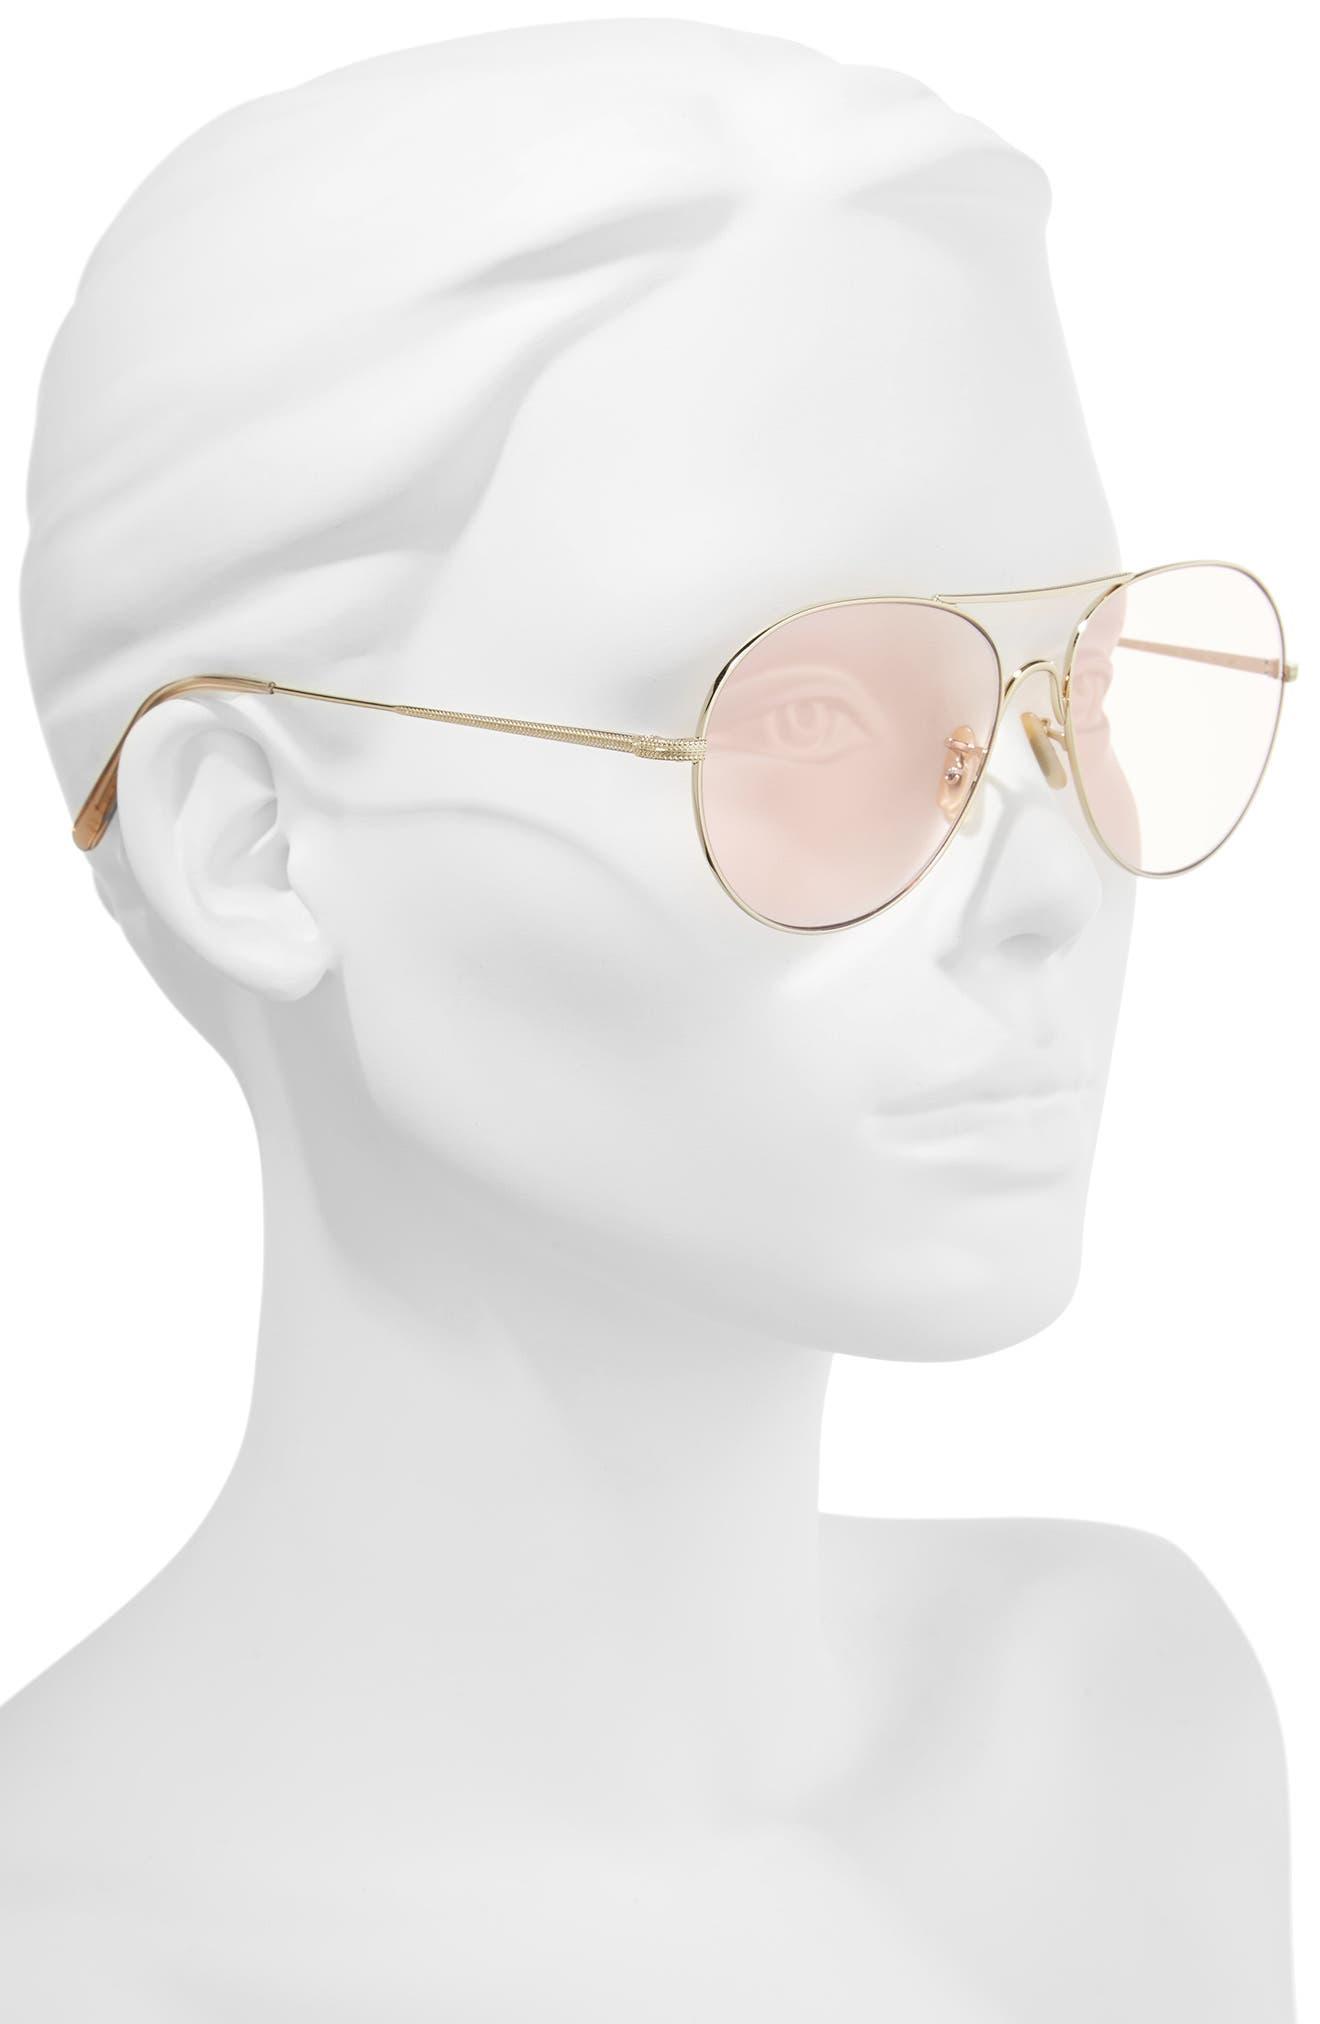 Rockmore 58mm Aviator Sunglasses,                             Alternate thumbnail 2, color,                             PINK